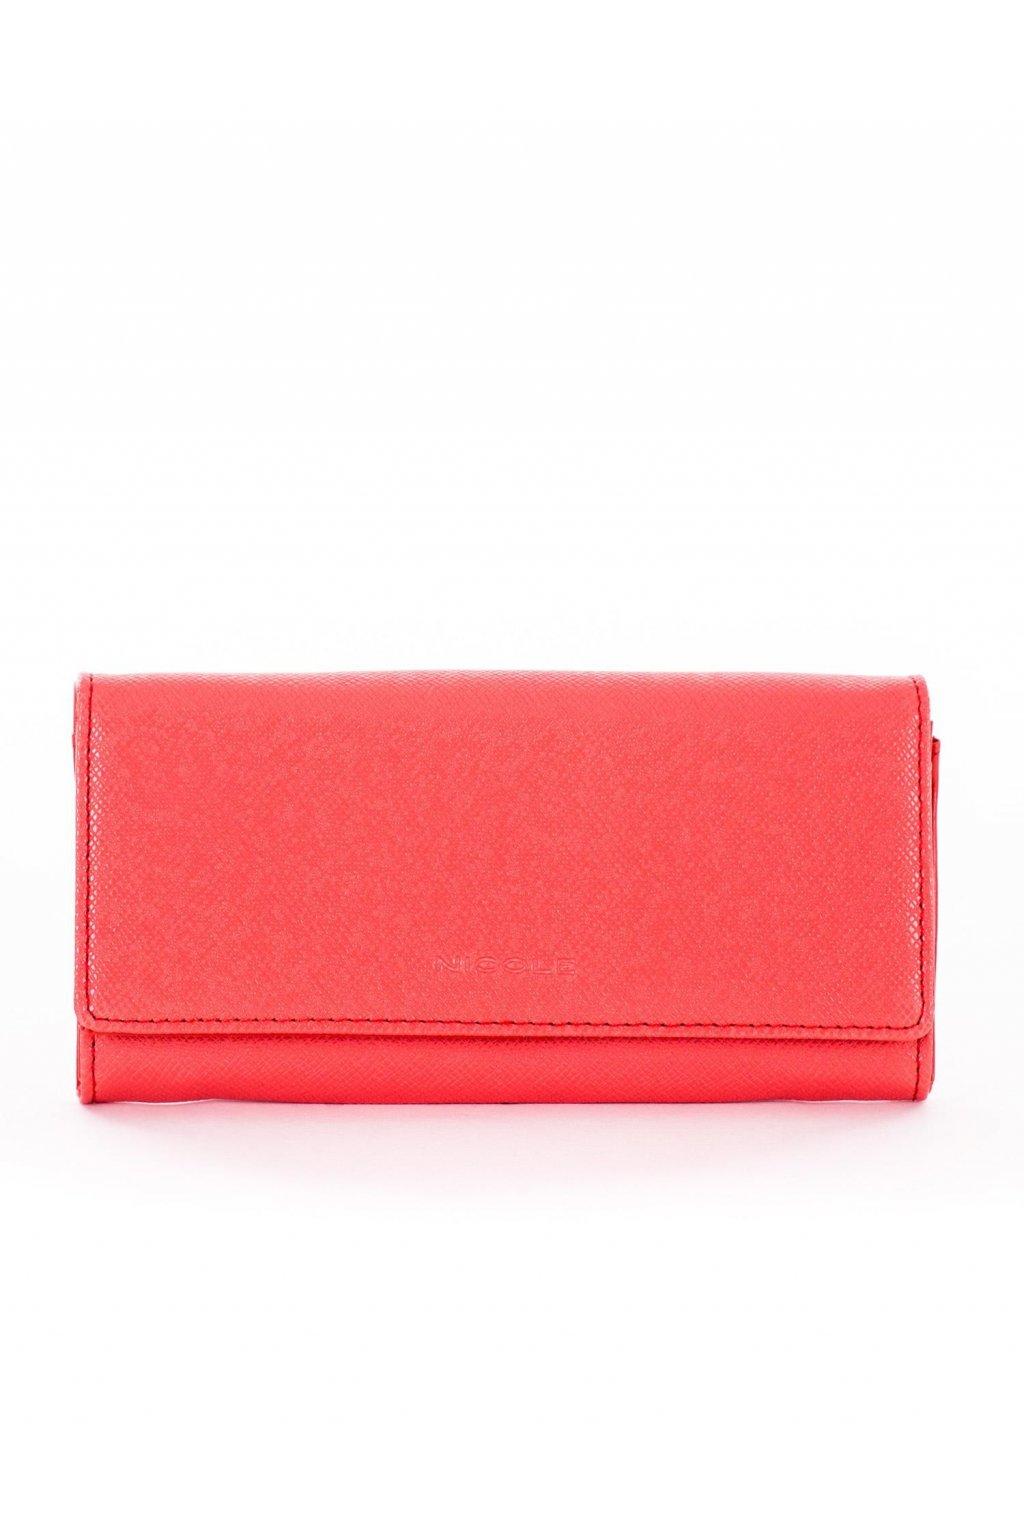 Peňaženka kód G104-12016